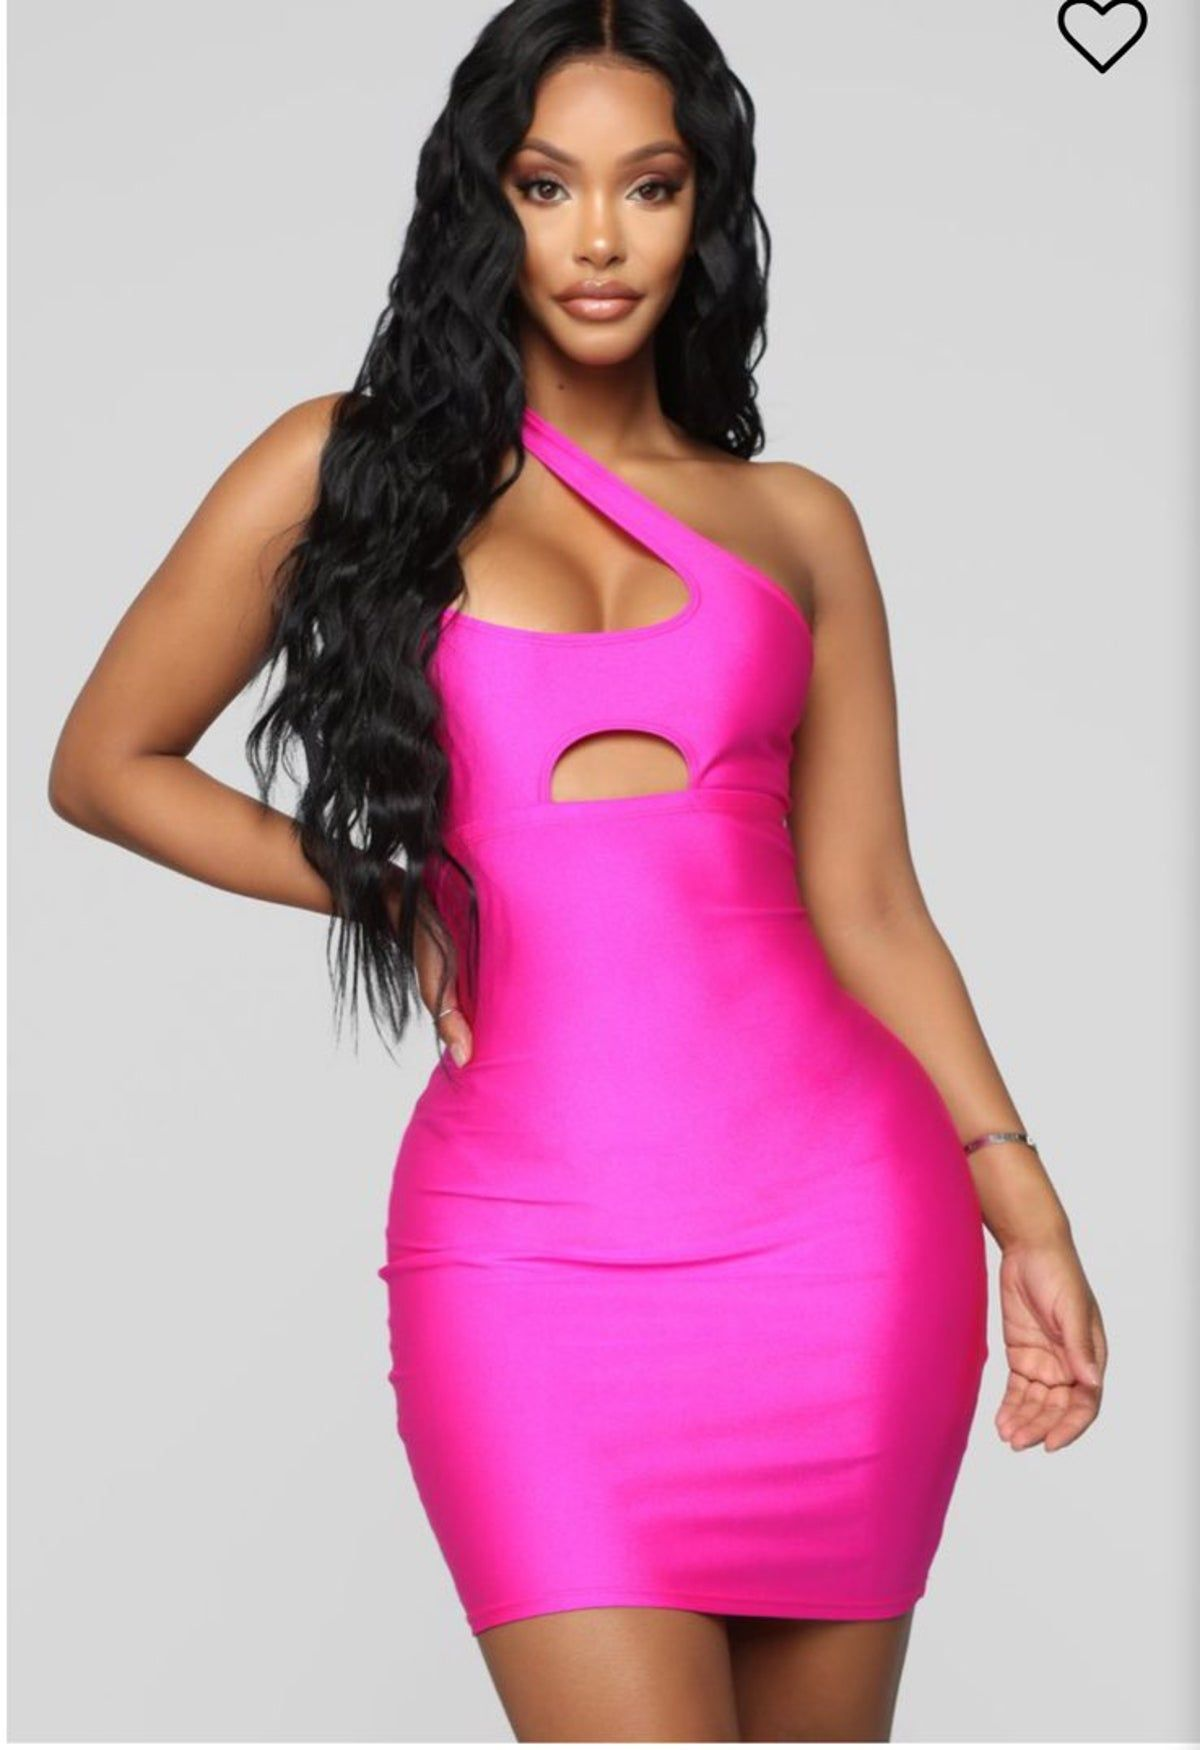 Fashion Nova Neon Pink Dress On Mercari Mini Dress Fashion Neon Dresses [ 1750 x 1200 Pixel ]